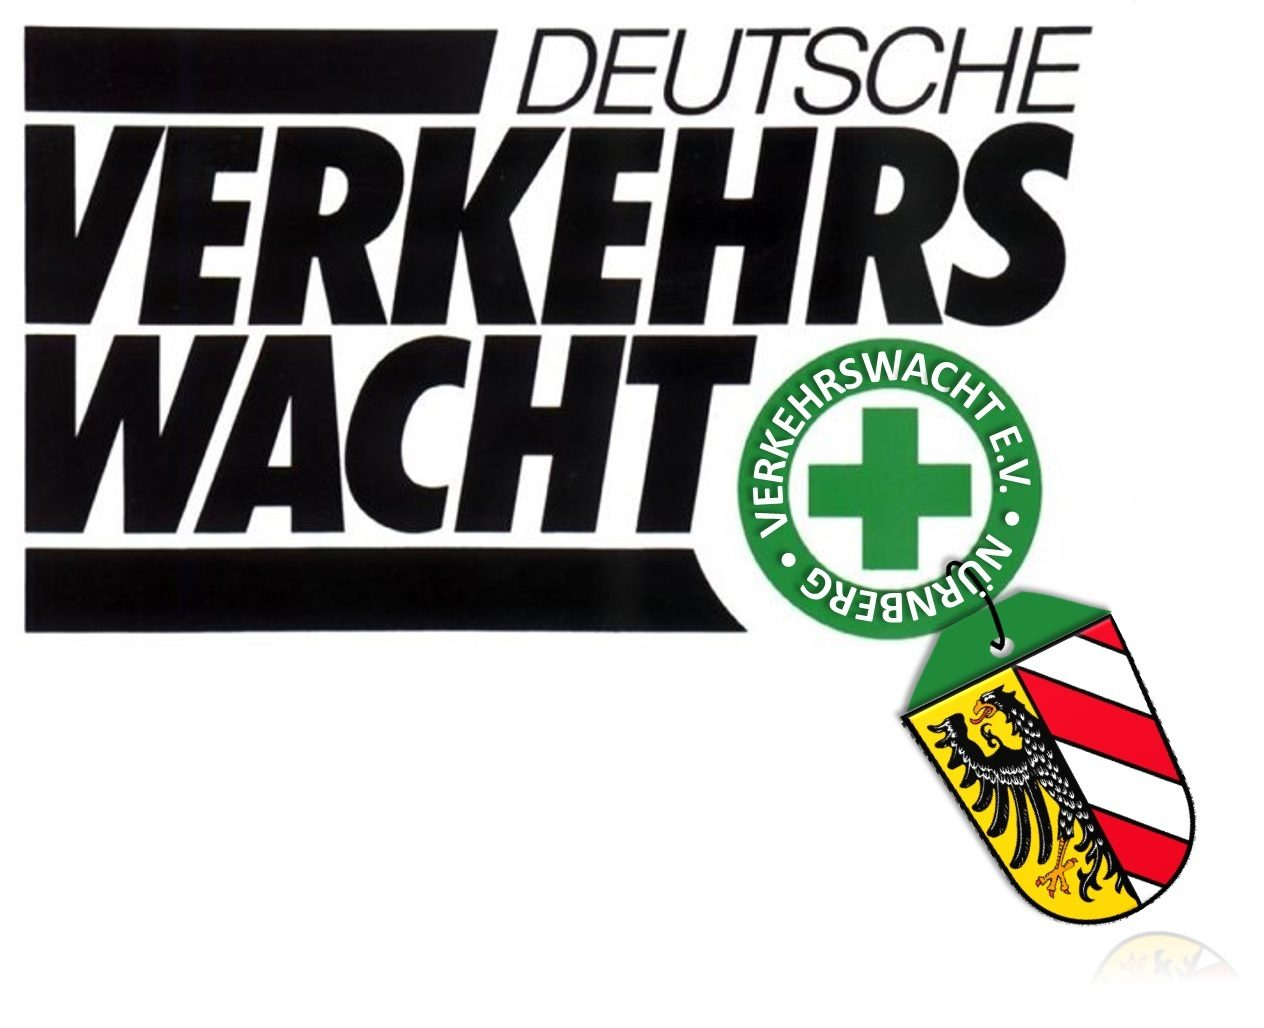 Deutsche Verkehrswacht Nürnberg